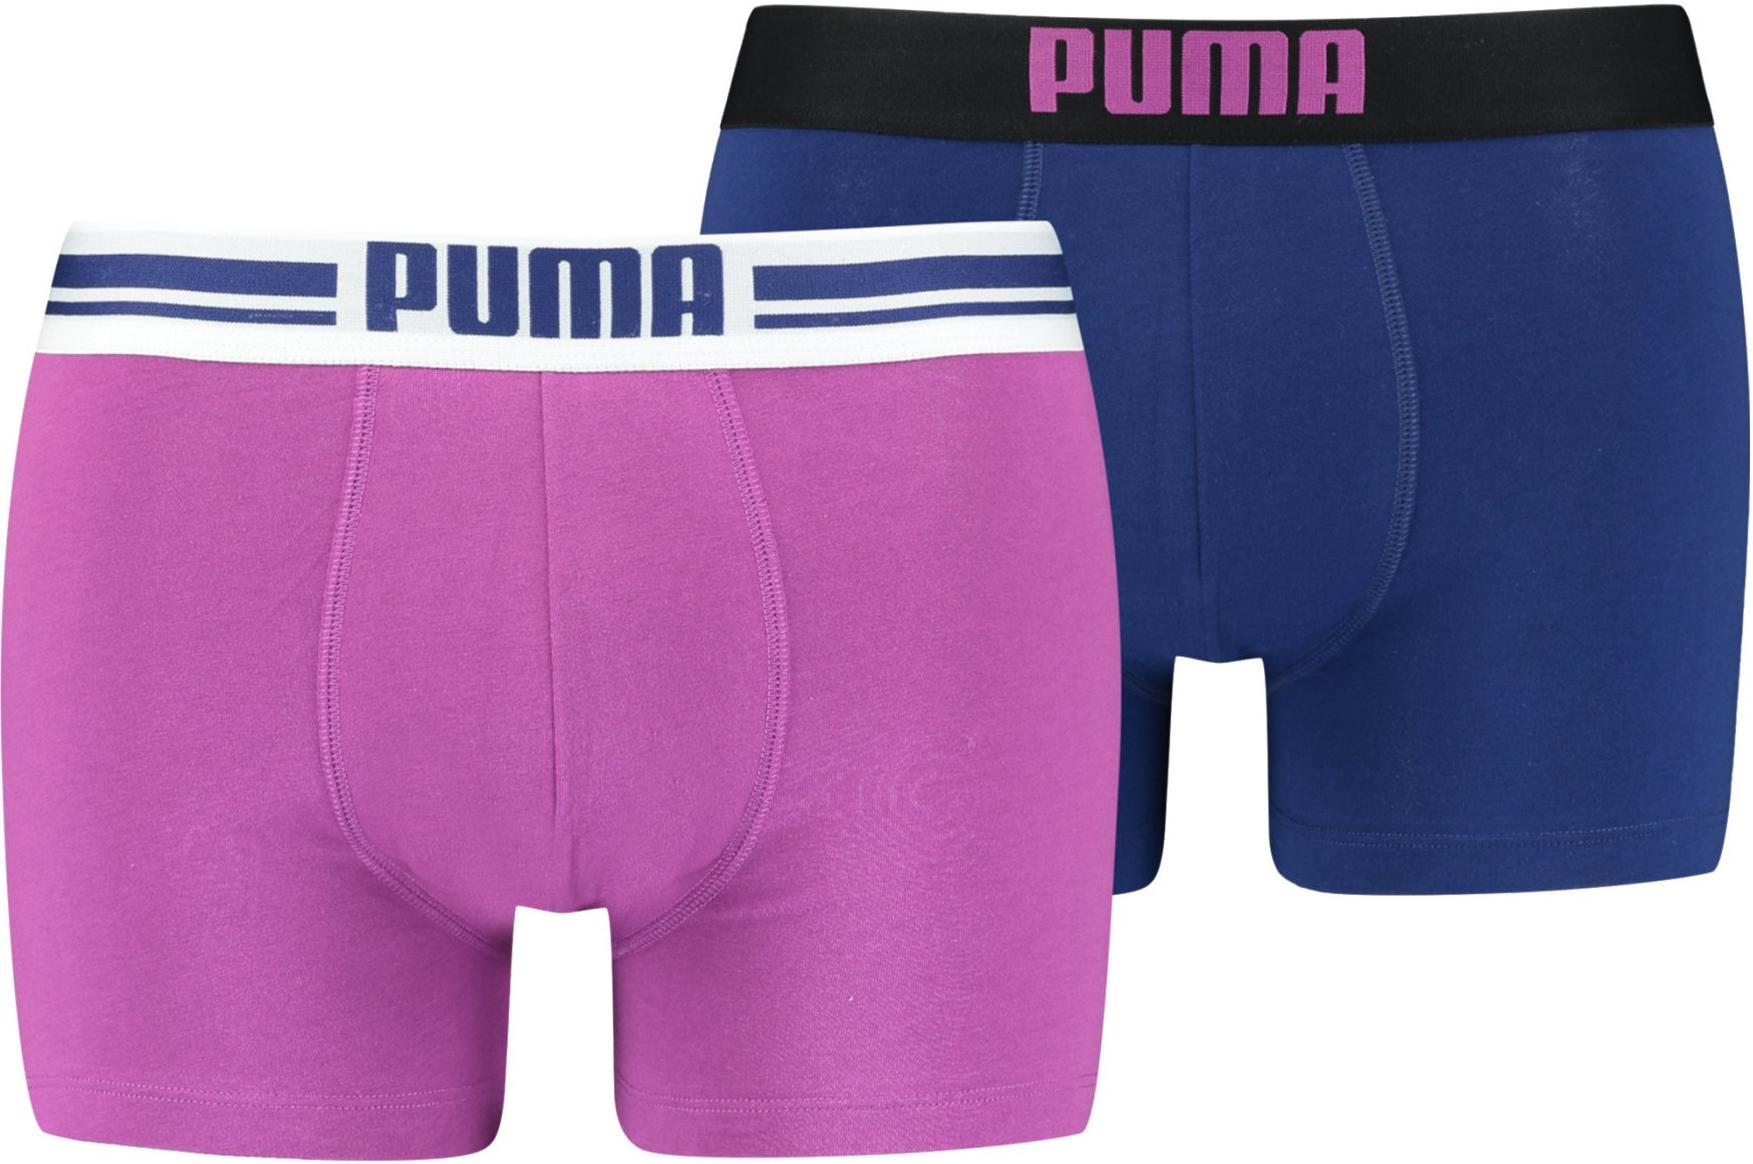 Caleçon Puma Placed Logo Boxer 2 PACK - Top4Fitness.ie